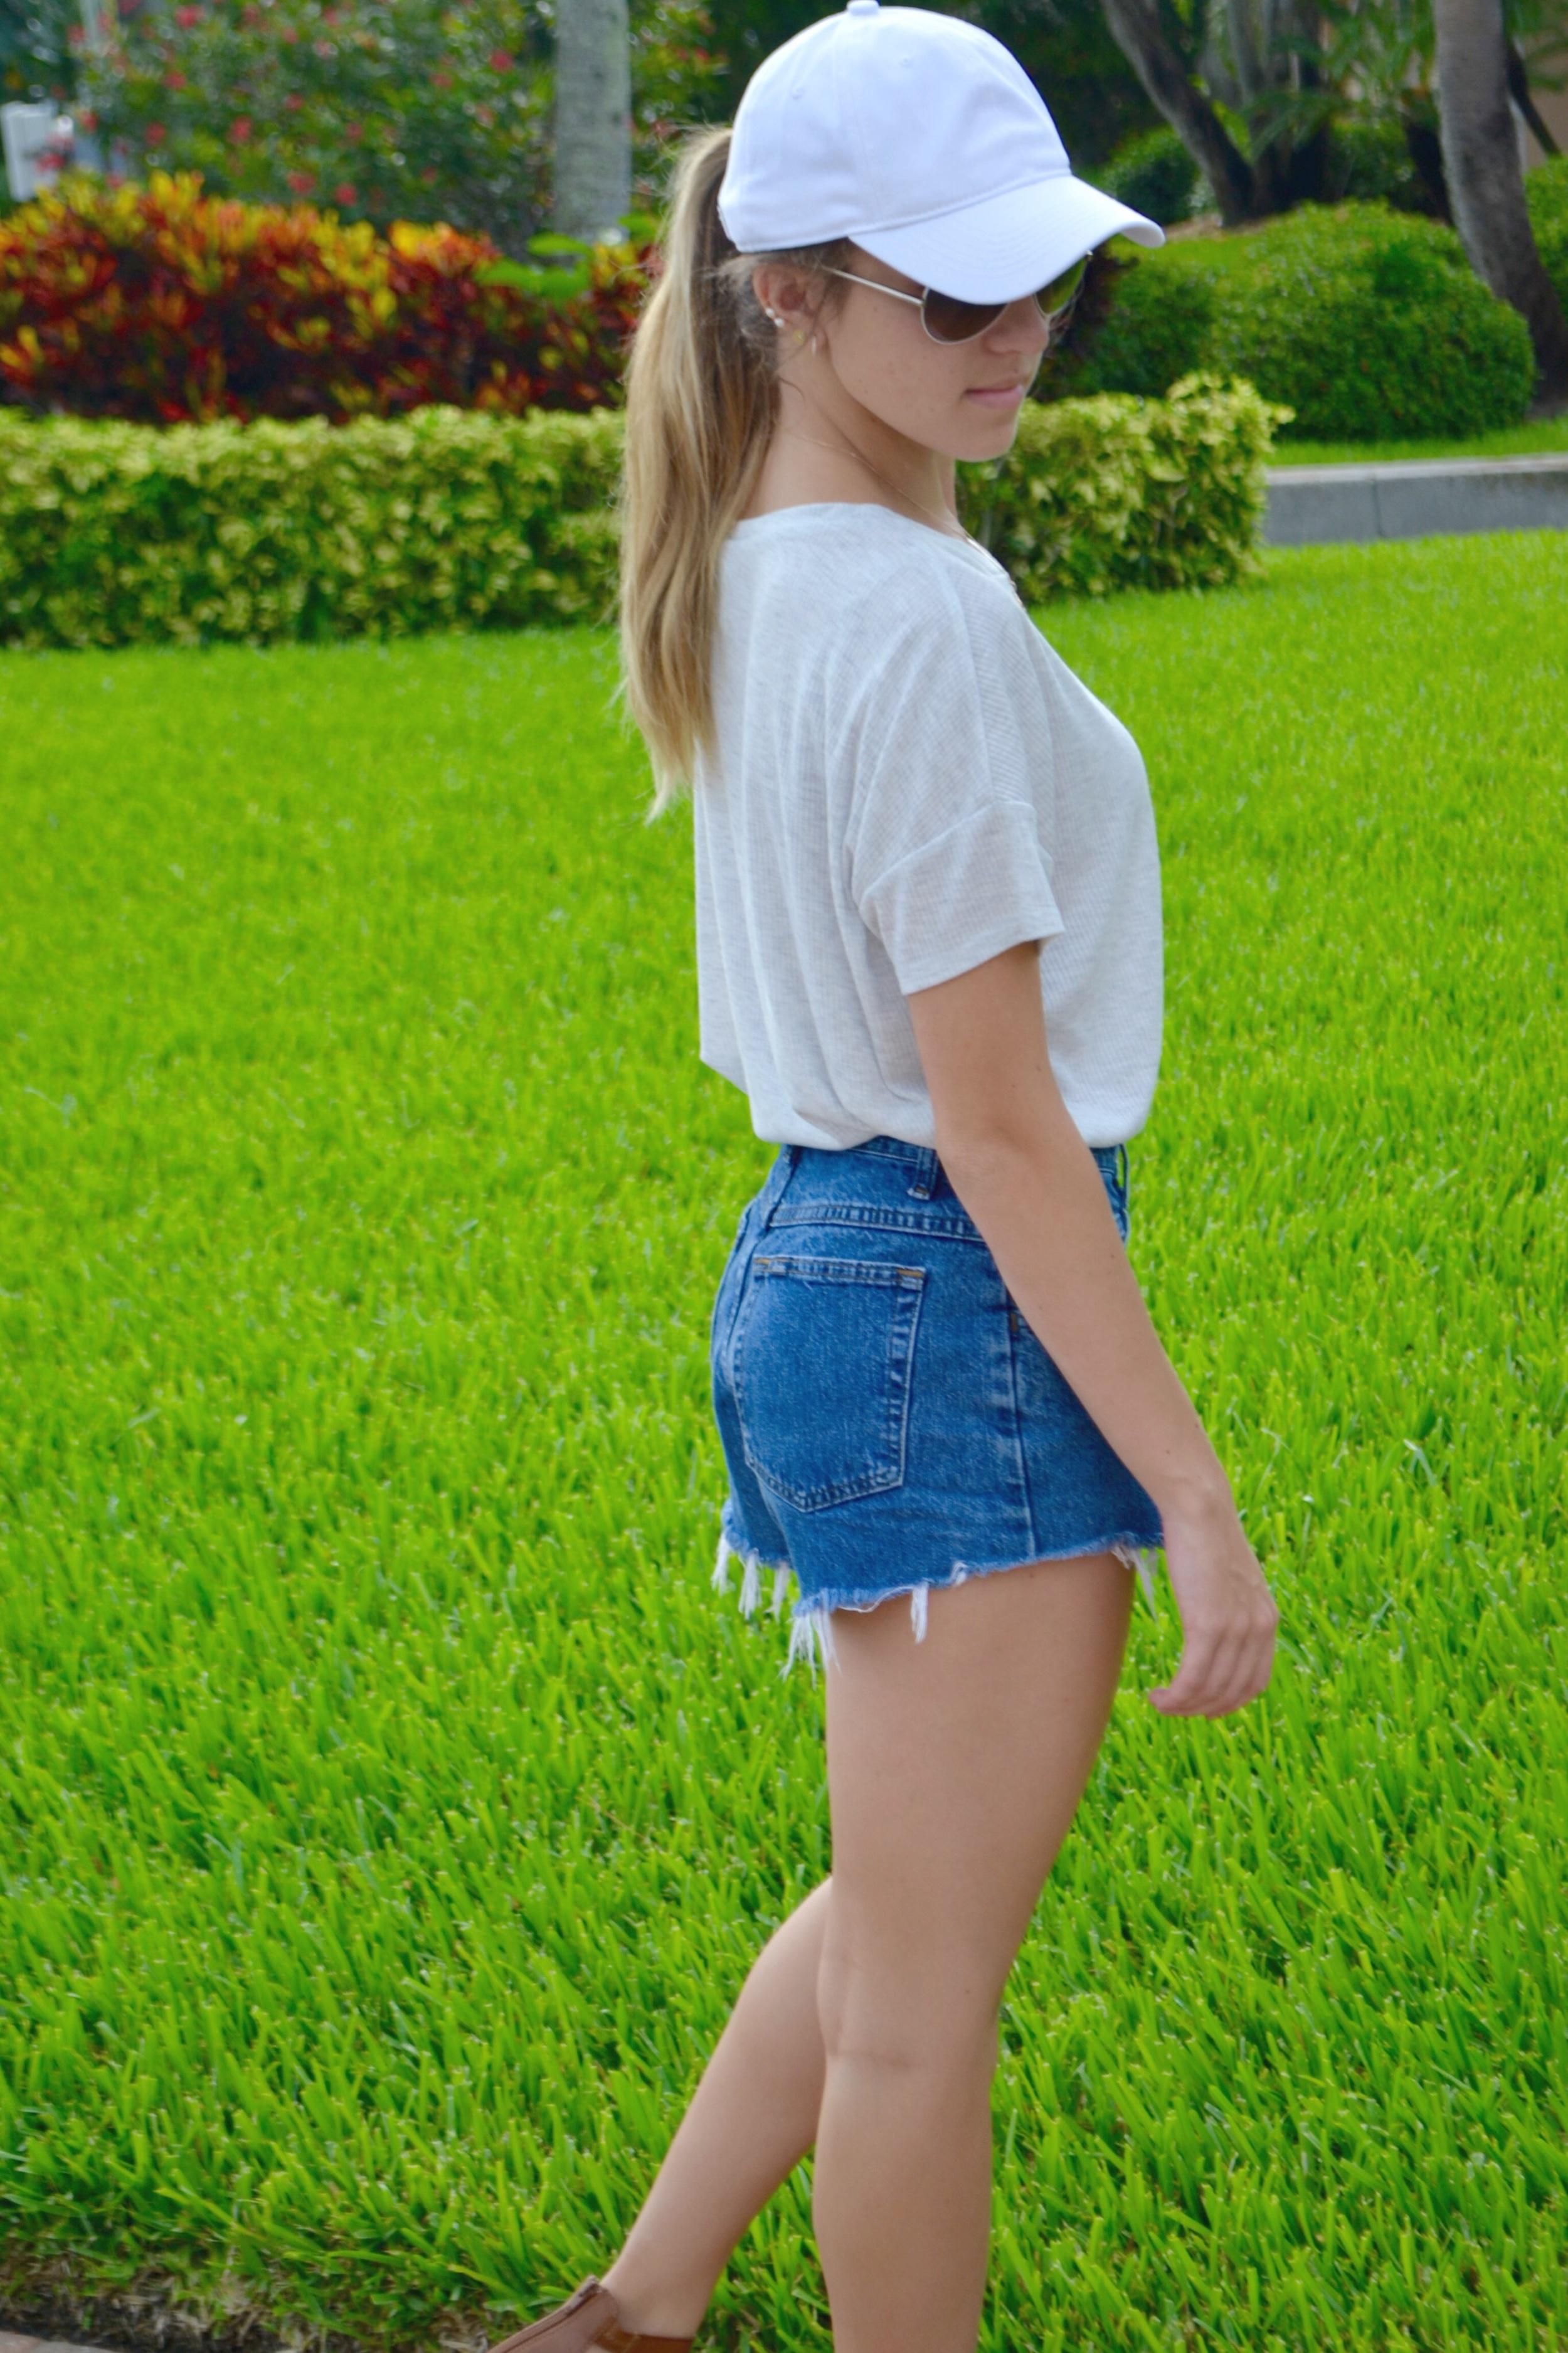 hat: target; shirt: h&m; shorts: a DIY #momjeans; shoes: express; sunglasses: Chloé